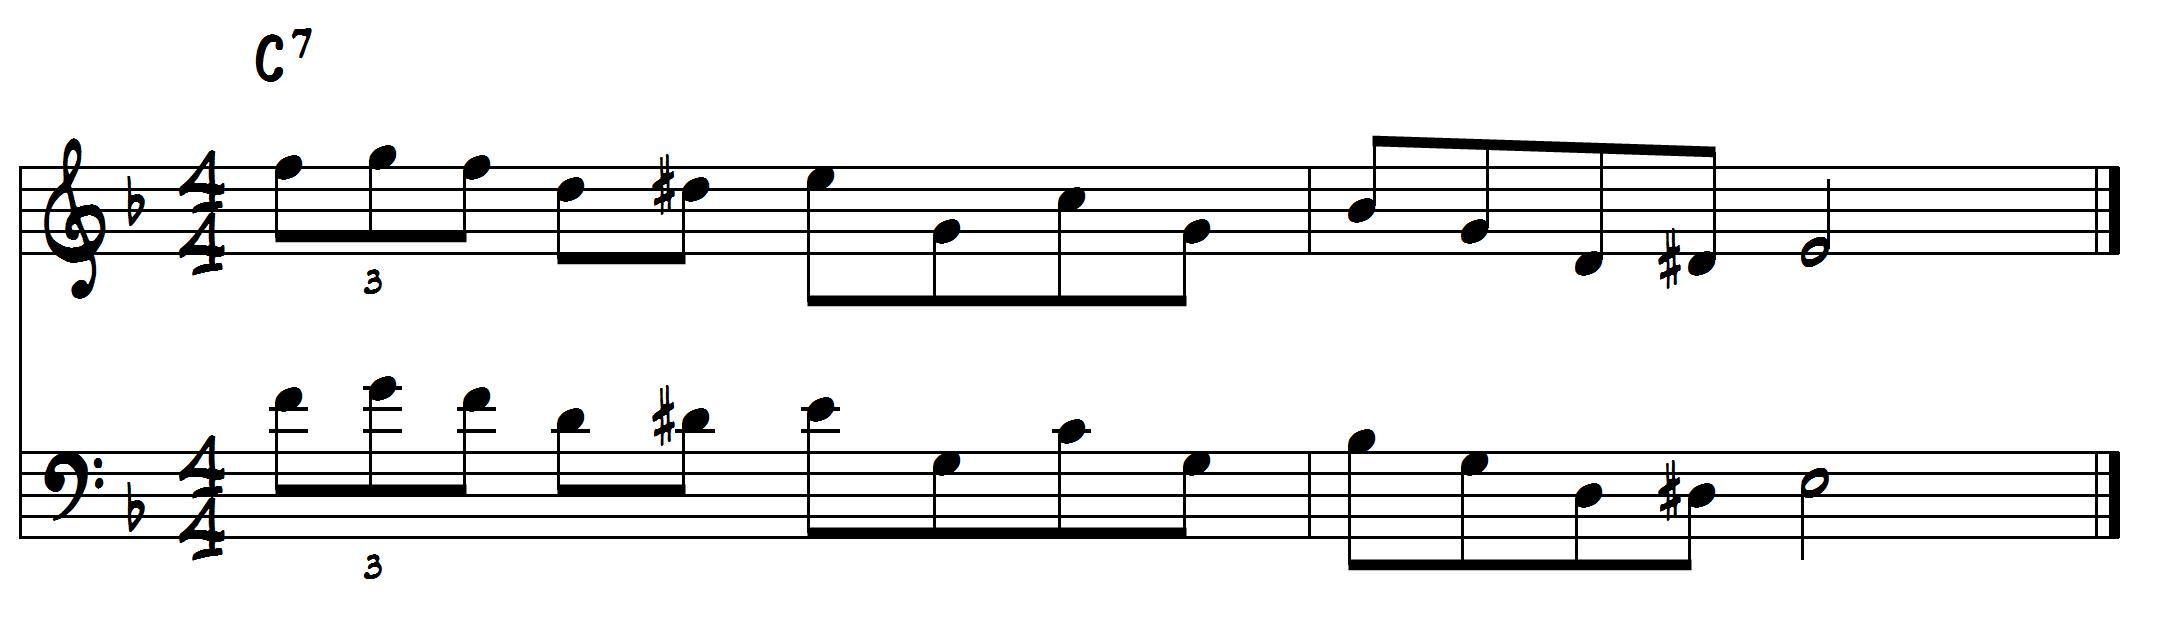 6 Jazz Licks Over Dominant 7 Chords - Learn Jazz Standards